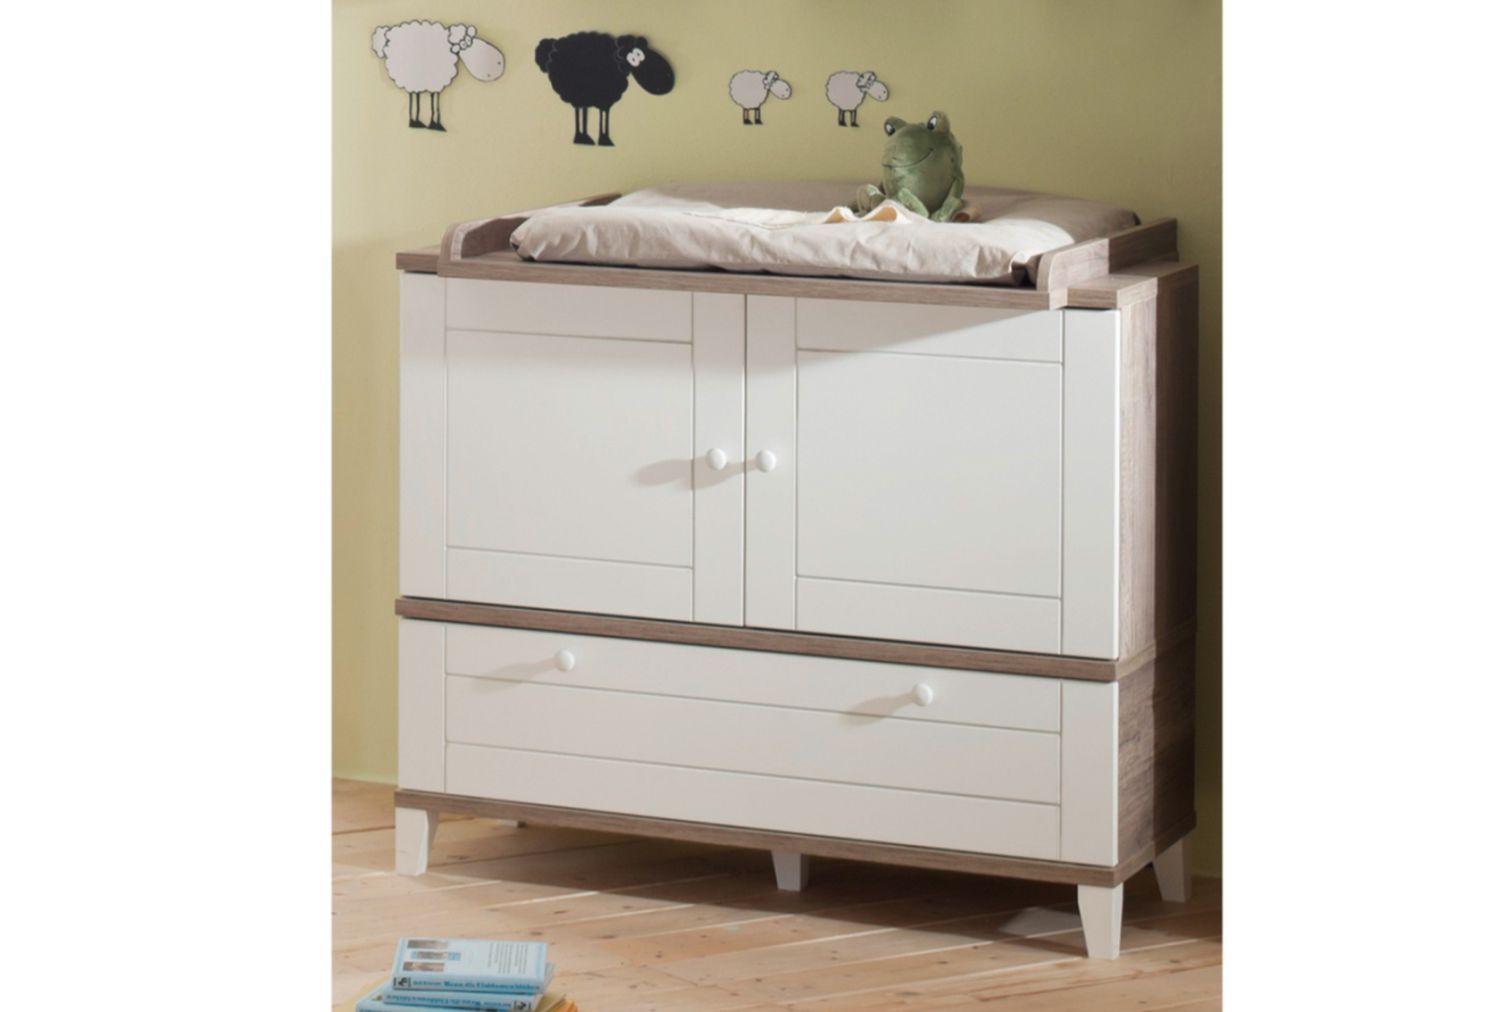 segm ller parsdorf wohnzimmer hocker. Black Bedroom Furniture Sets. Home Design Ideas